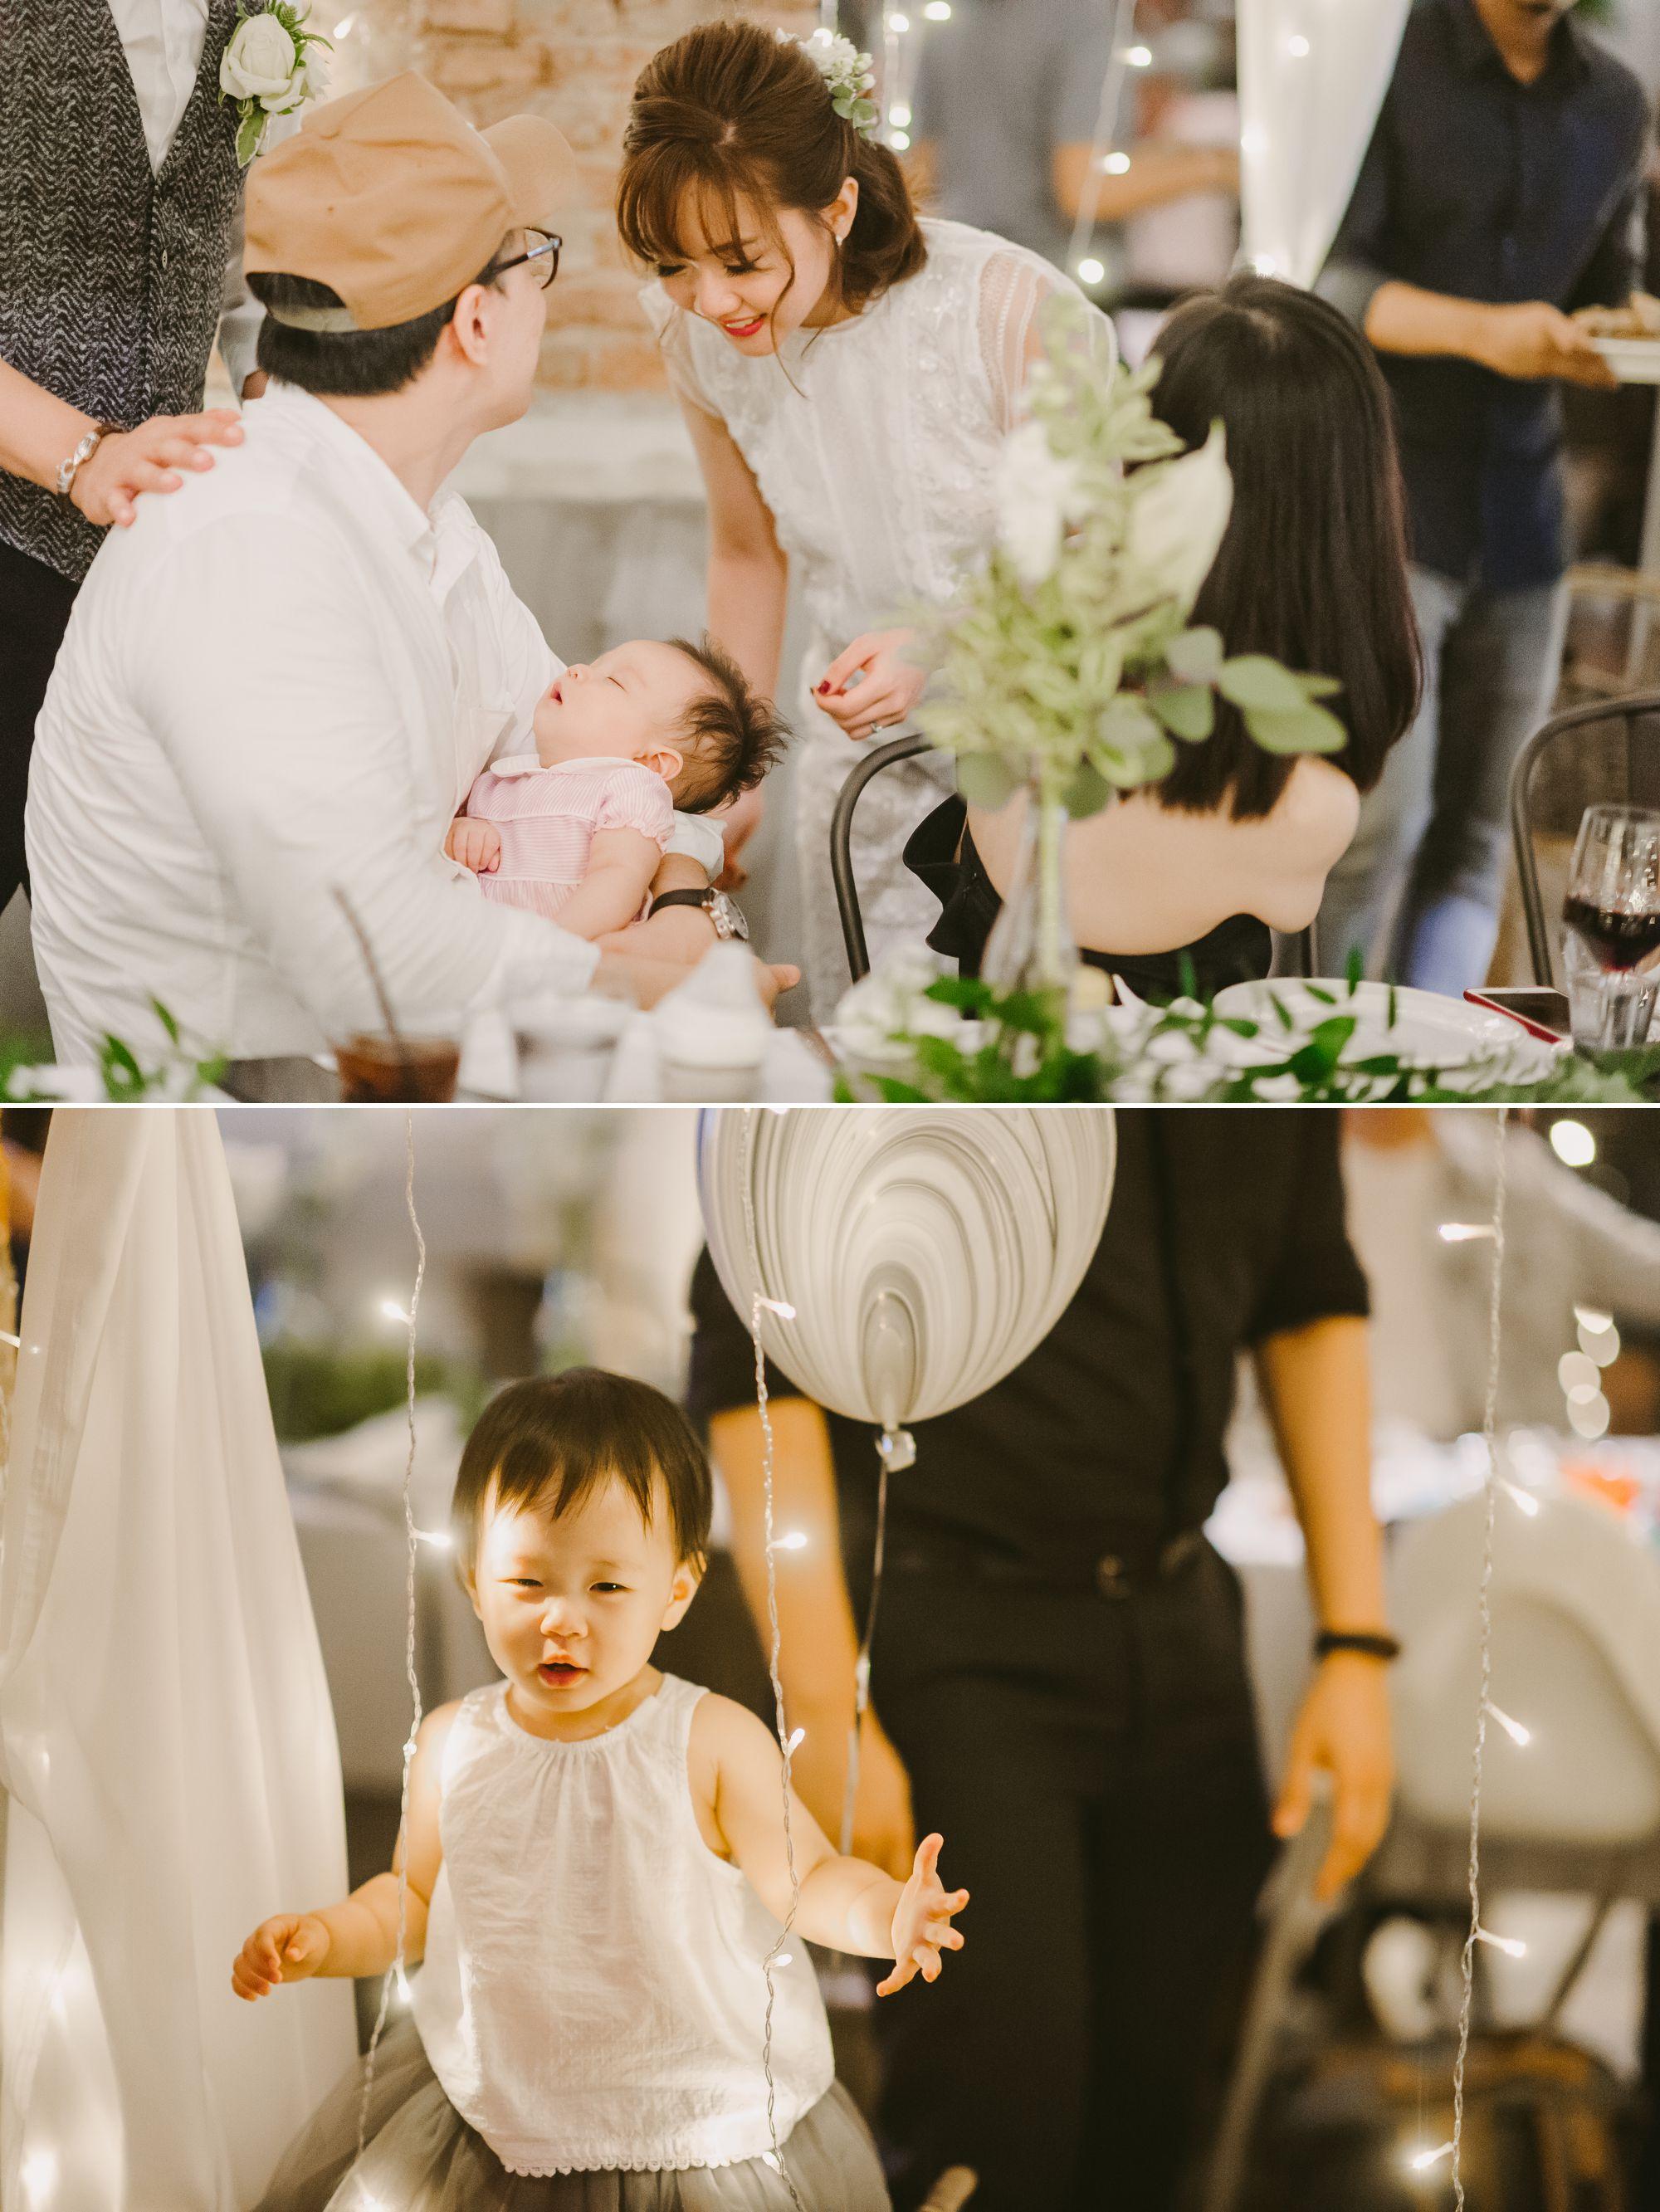 wedding_photography 38.jpg